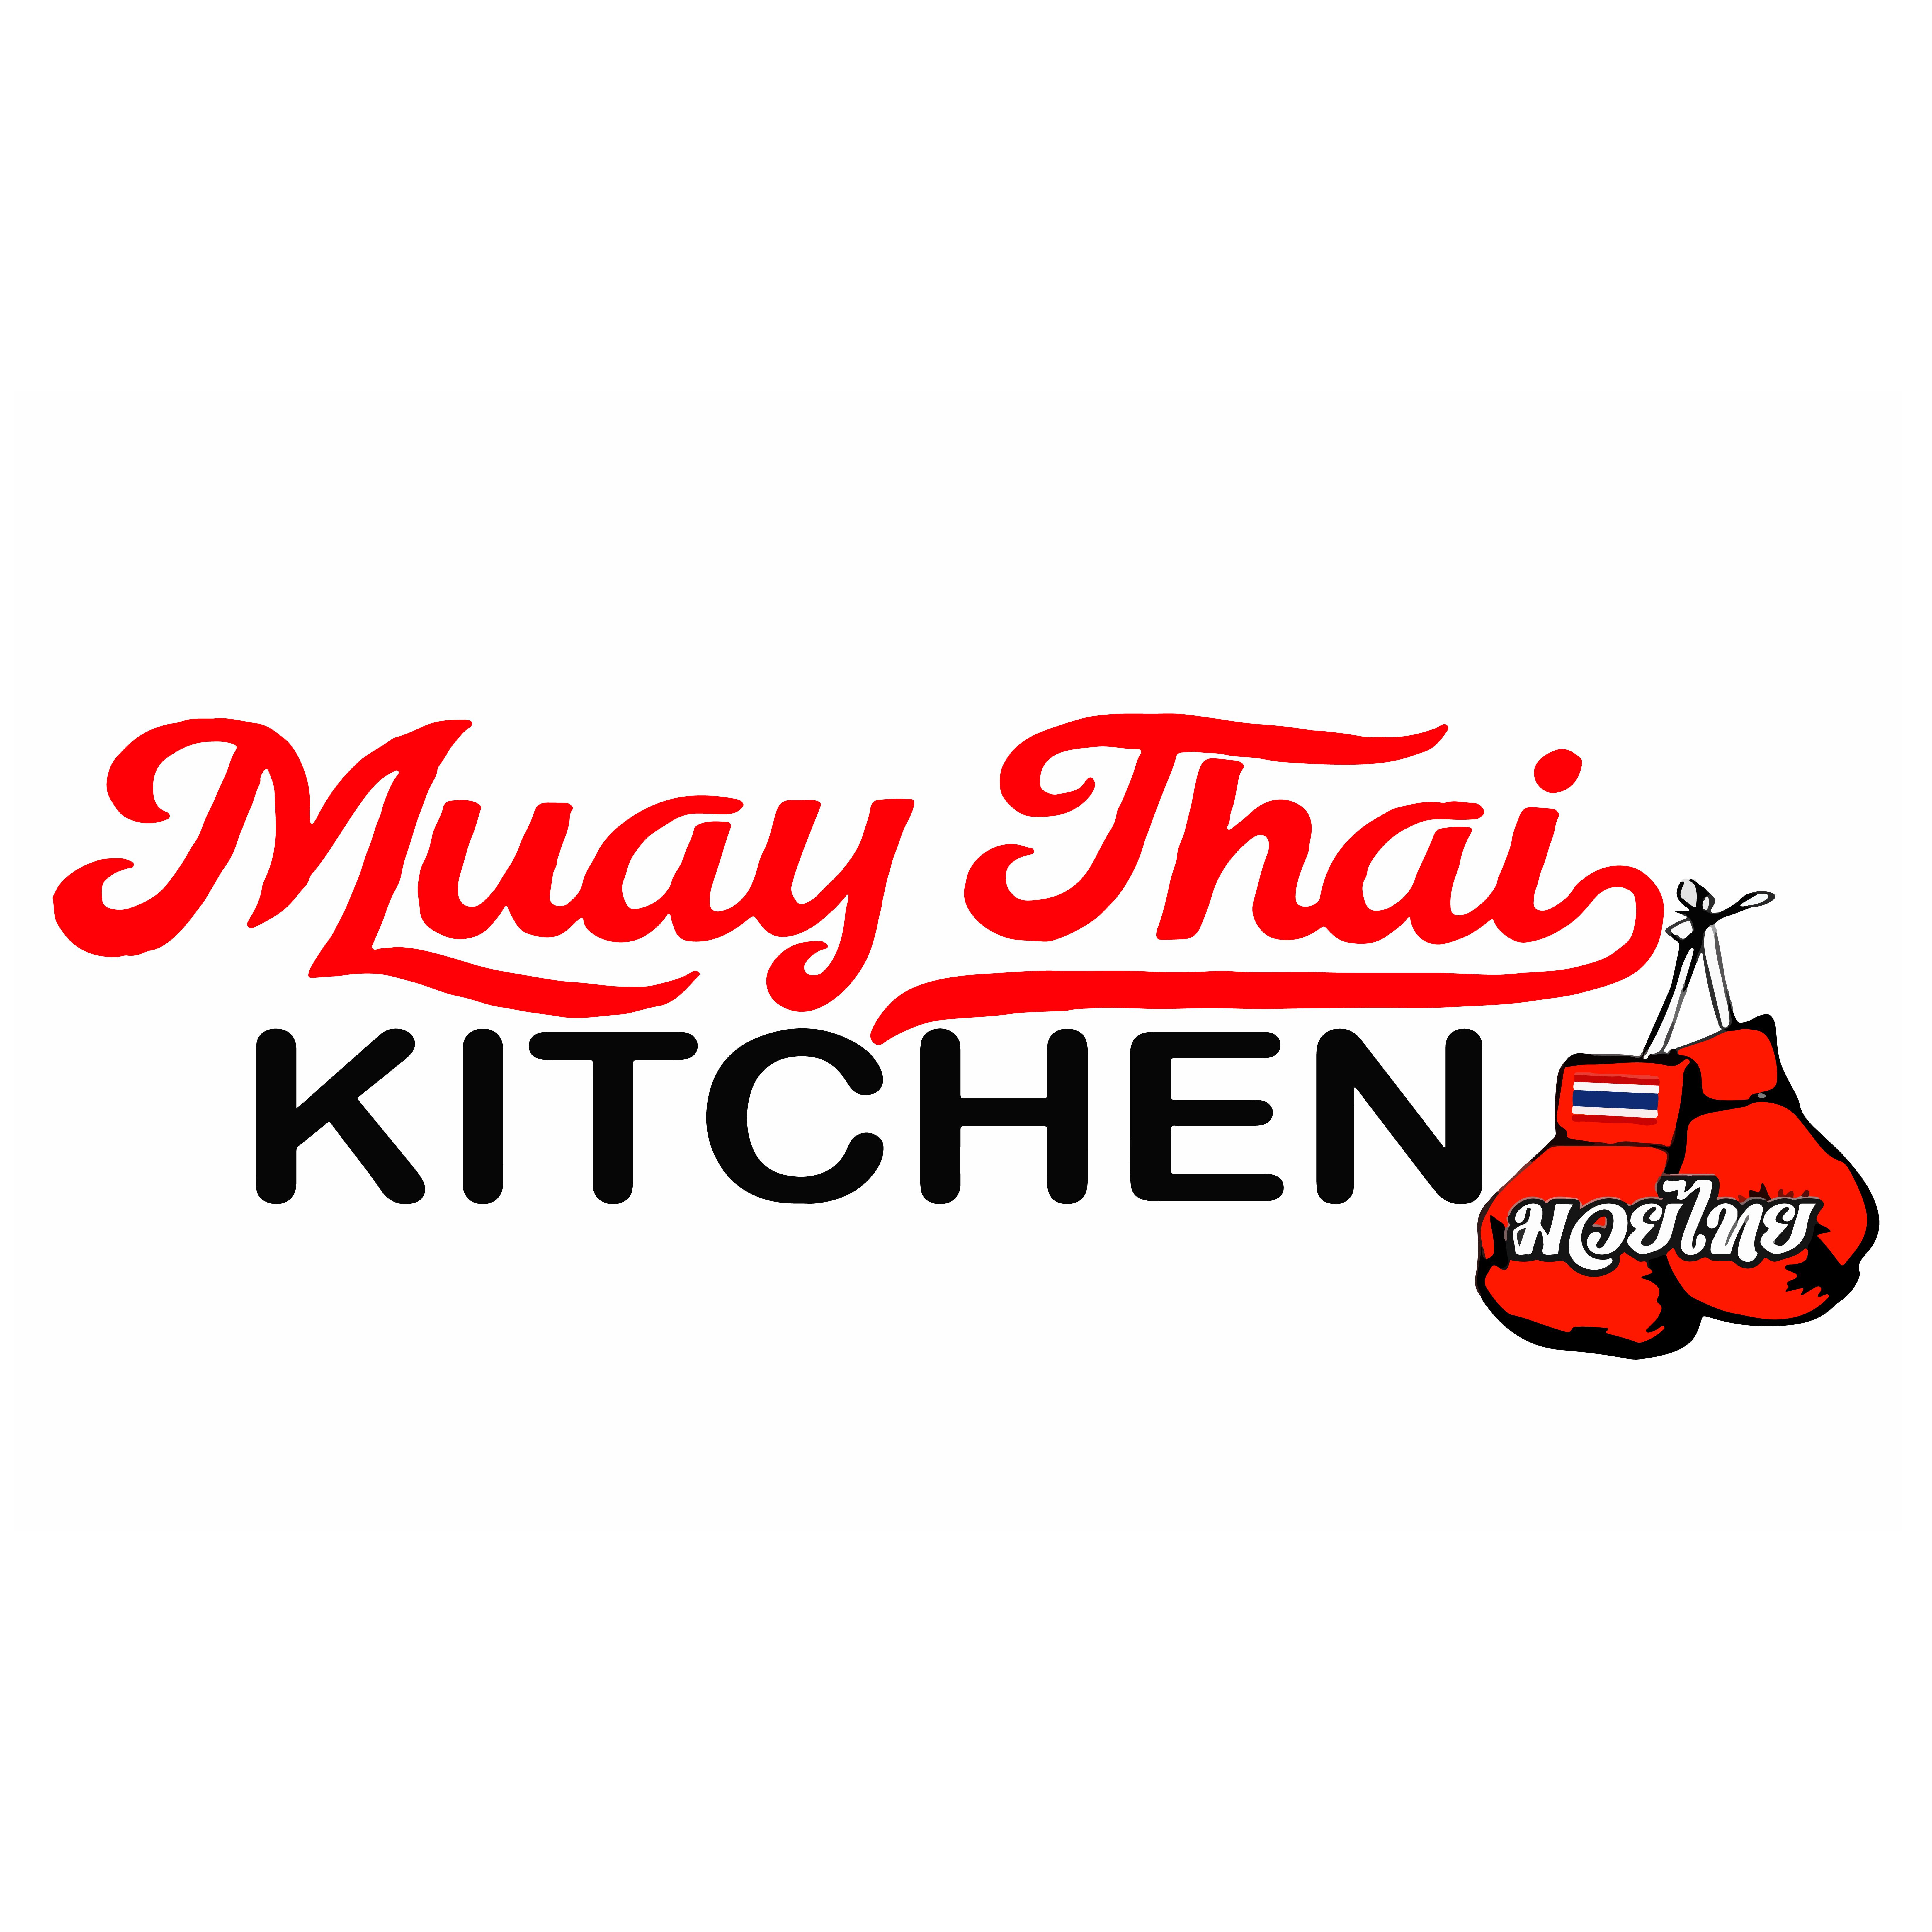 Muay Thai Kitchen